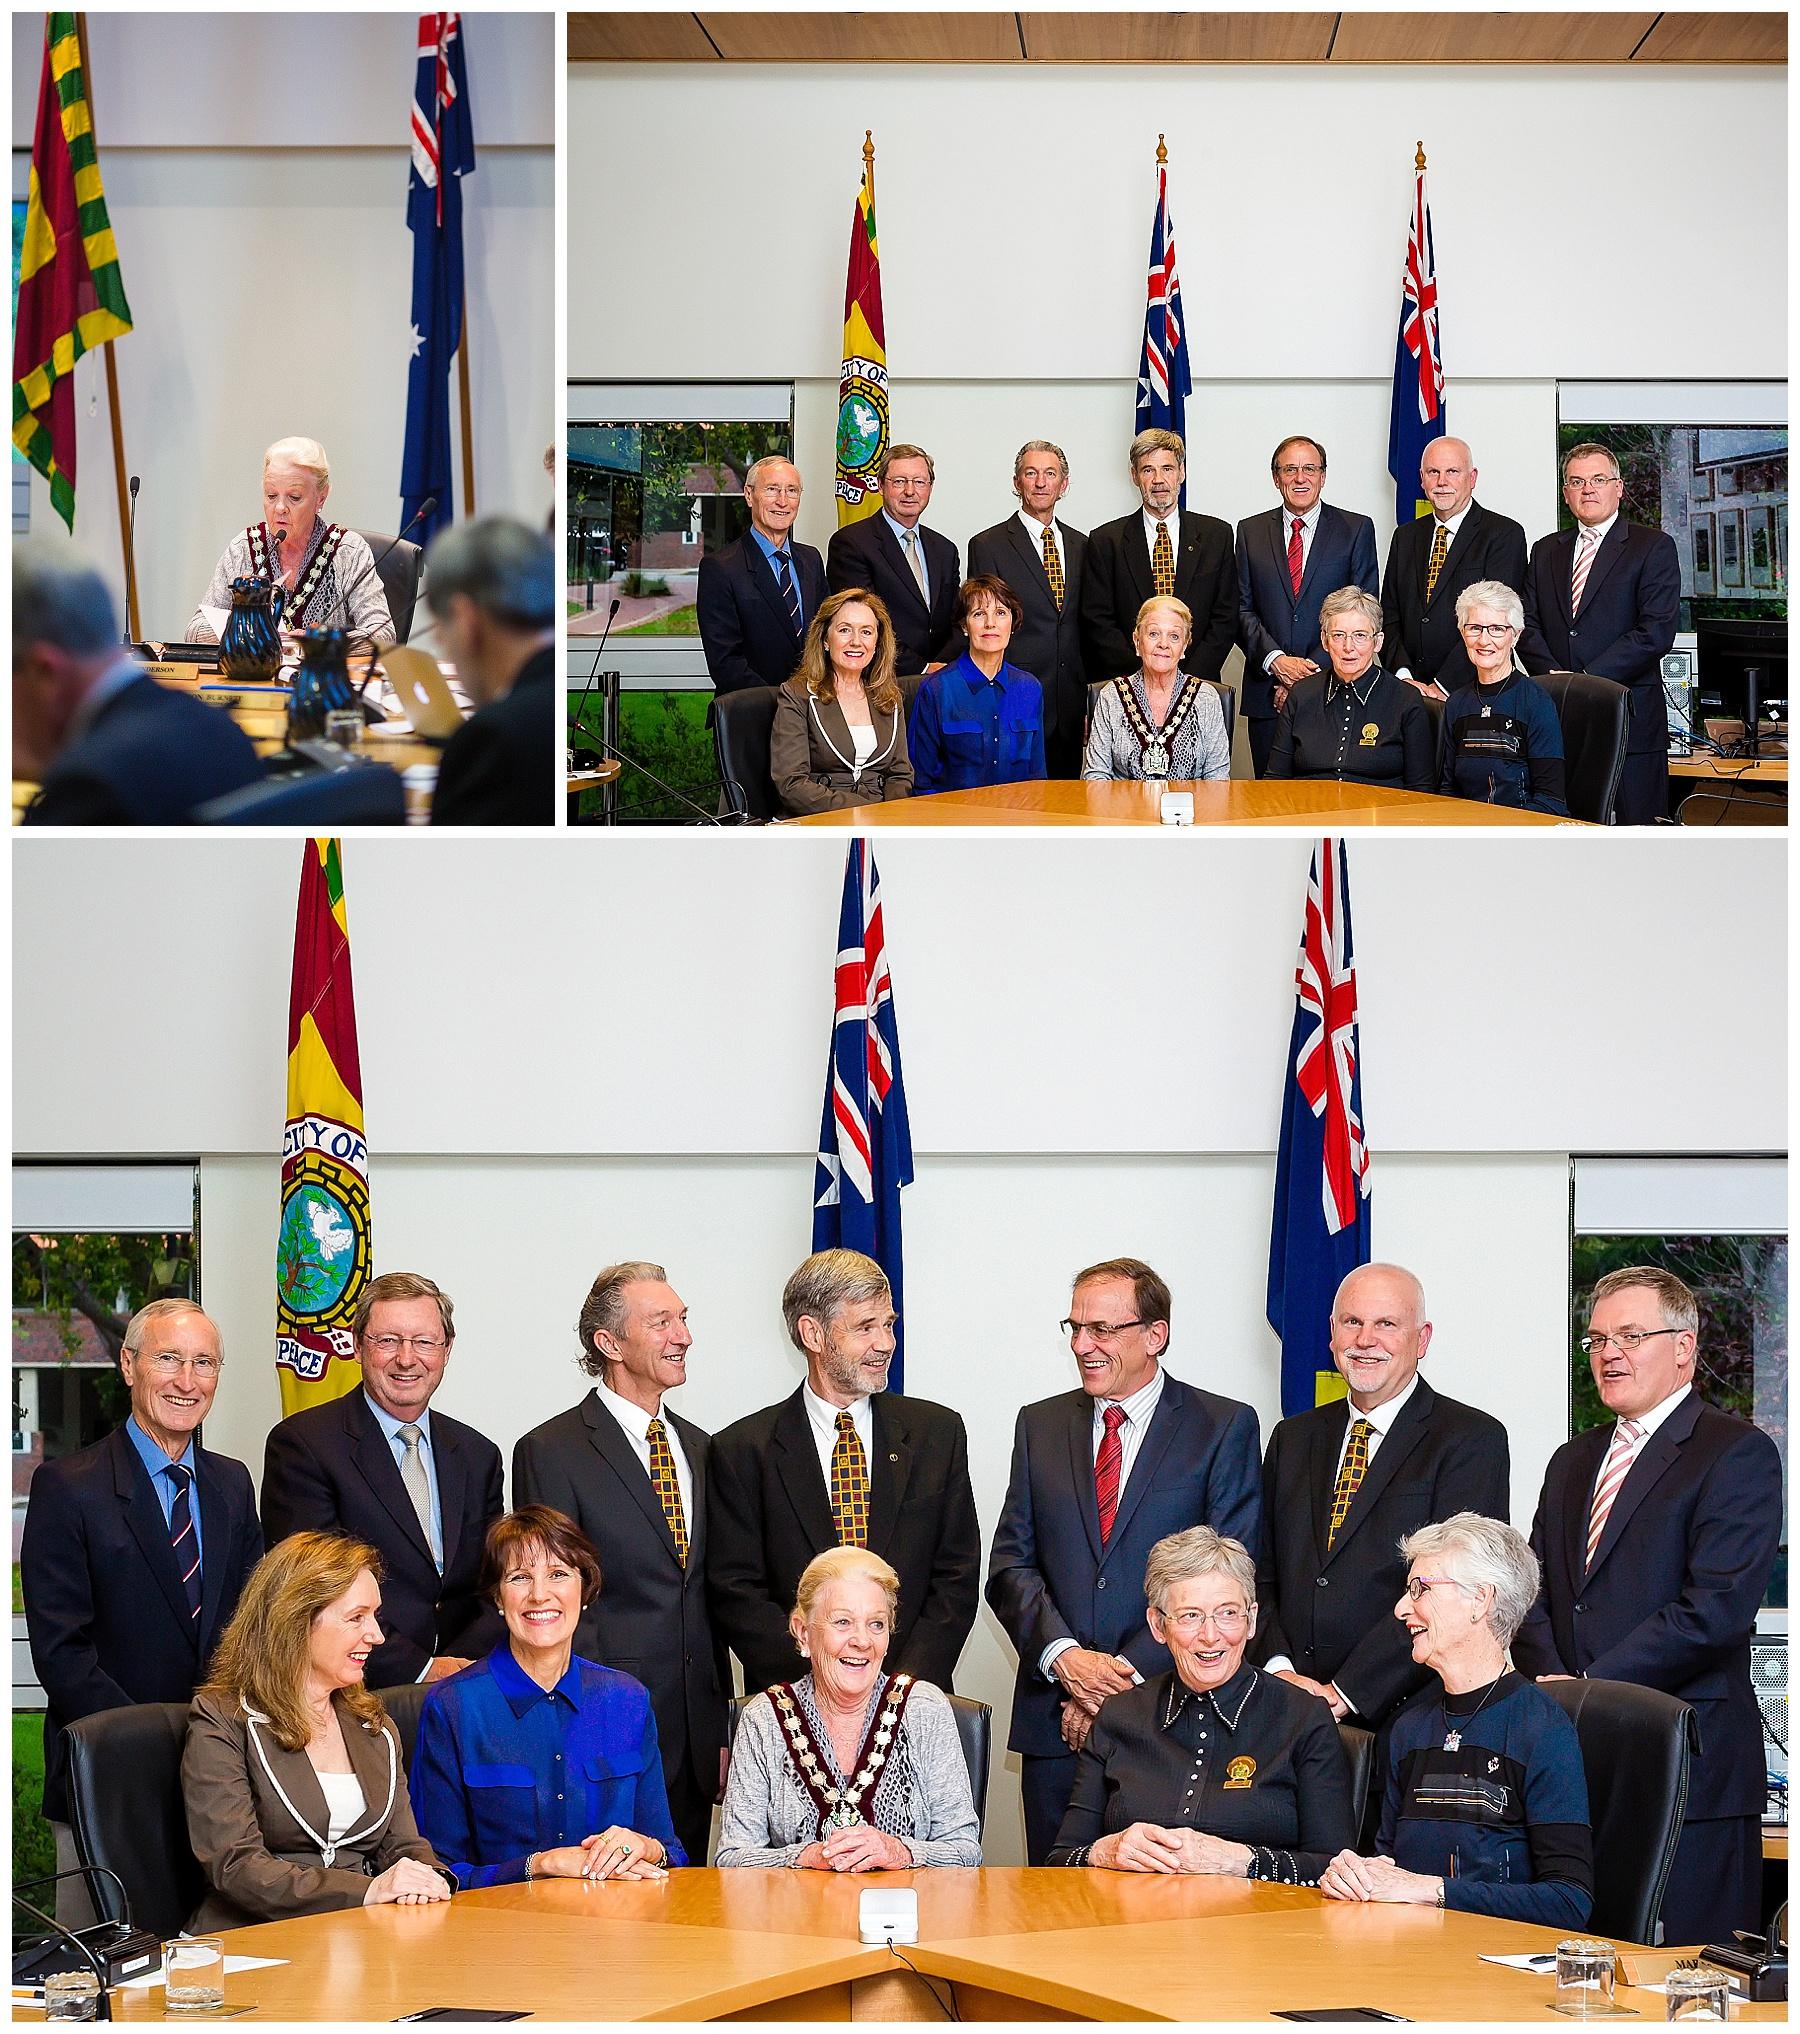 Council Group Photo